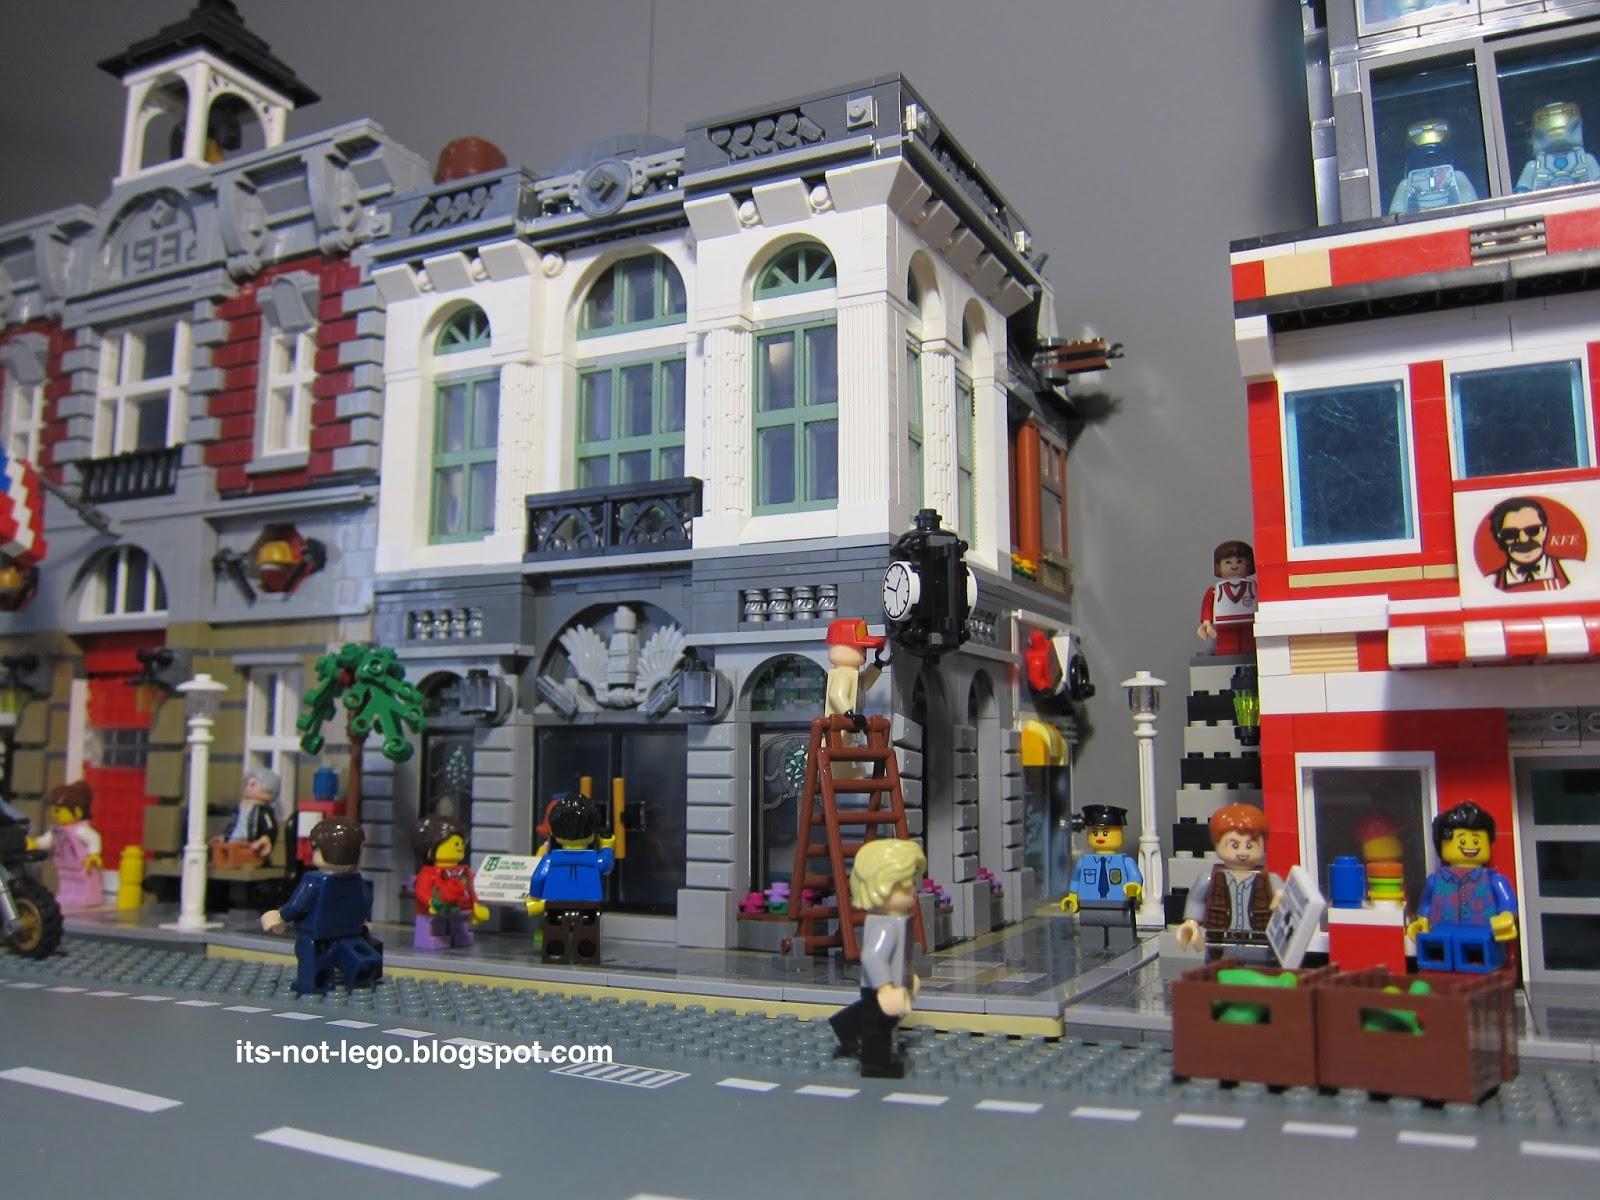 Lepin 15001 Fake Lego Brick Bank Modular Building Set Review